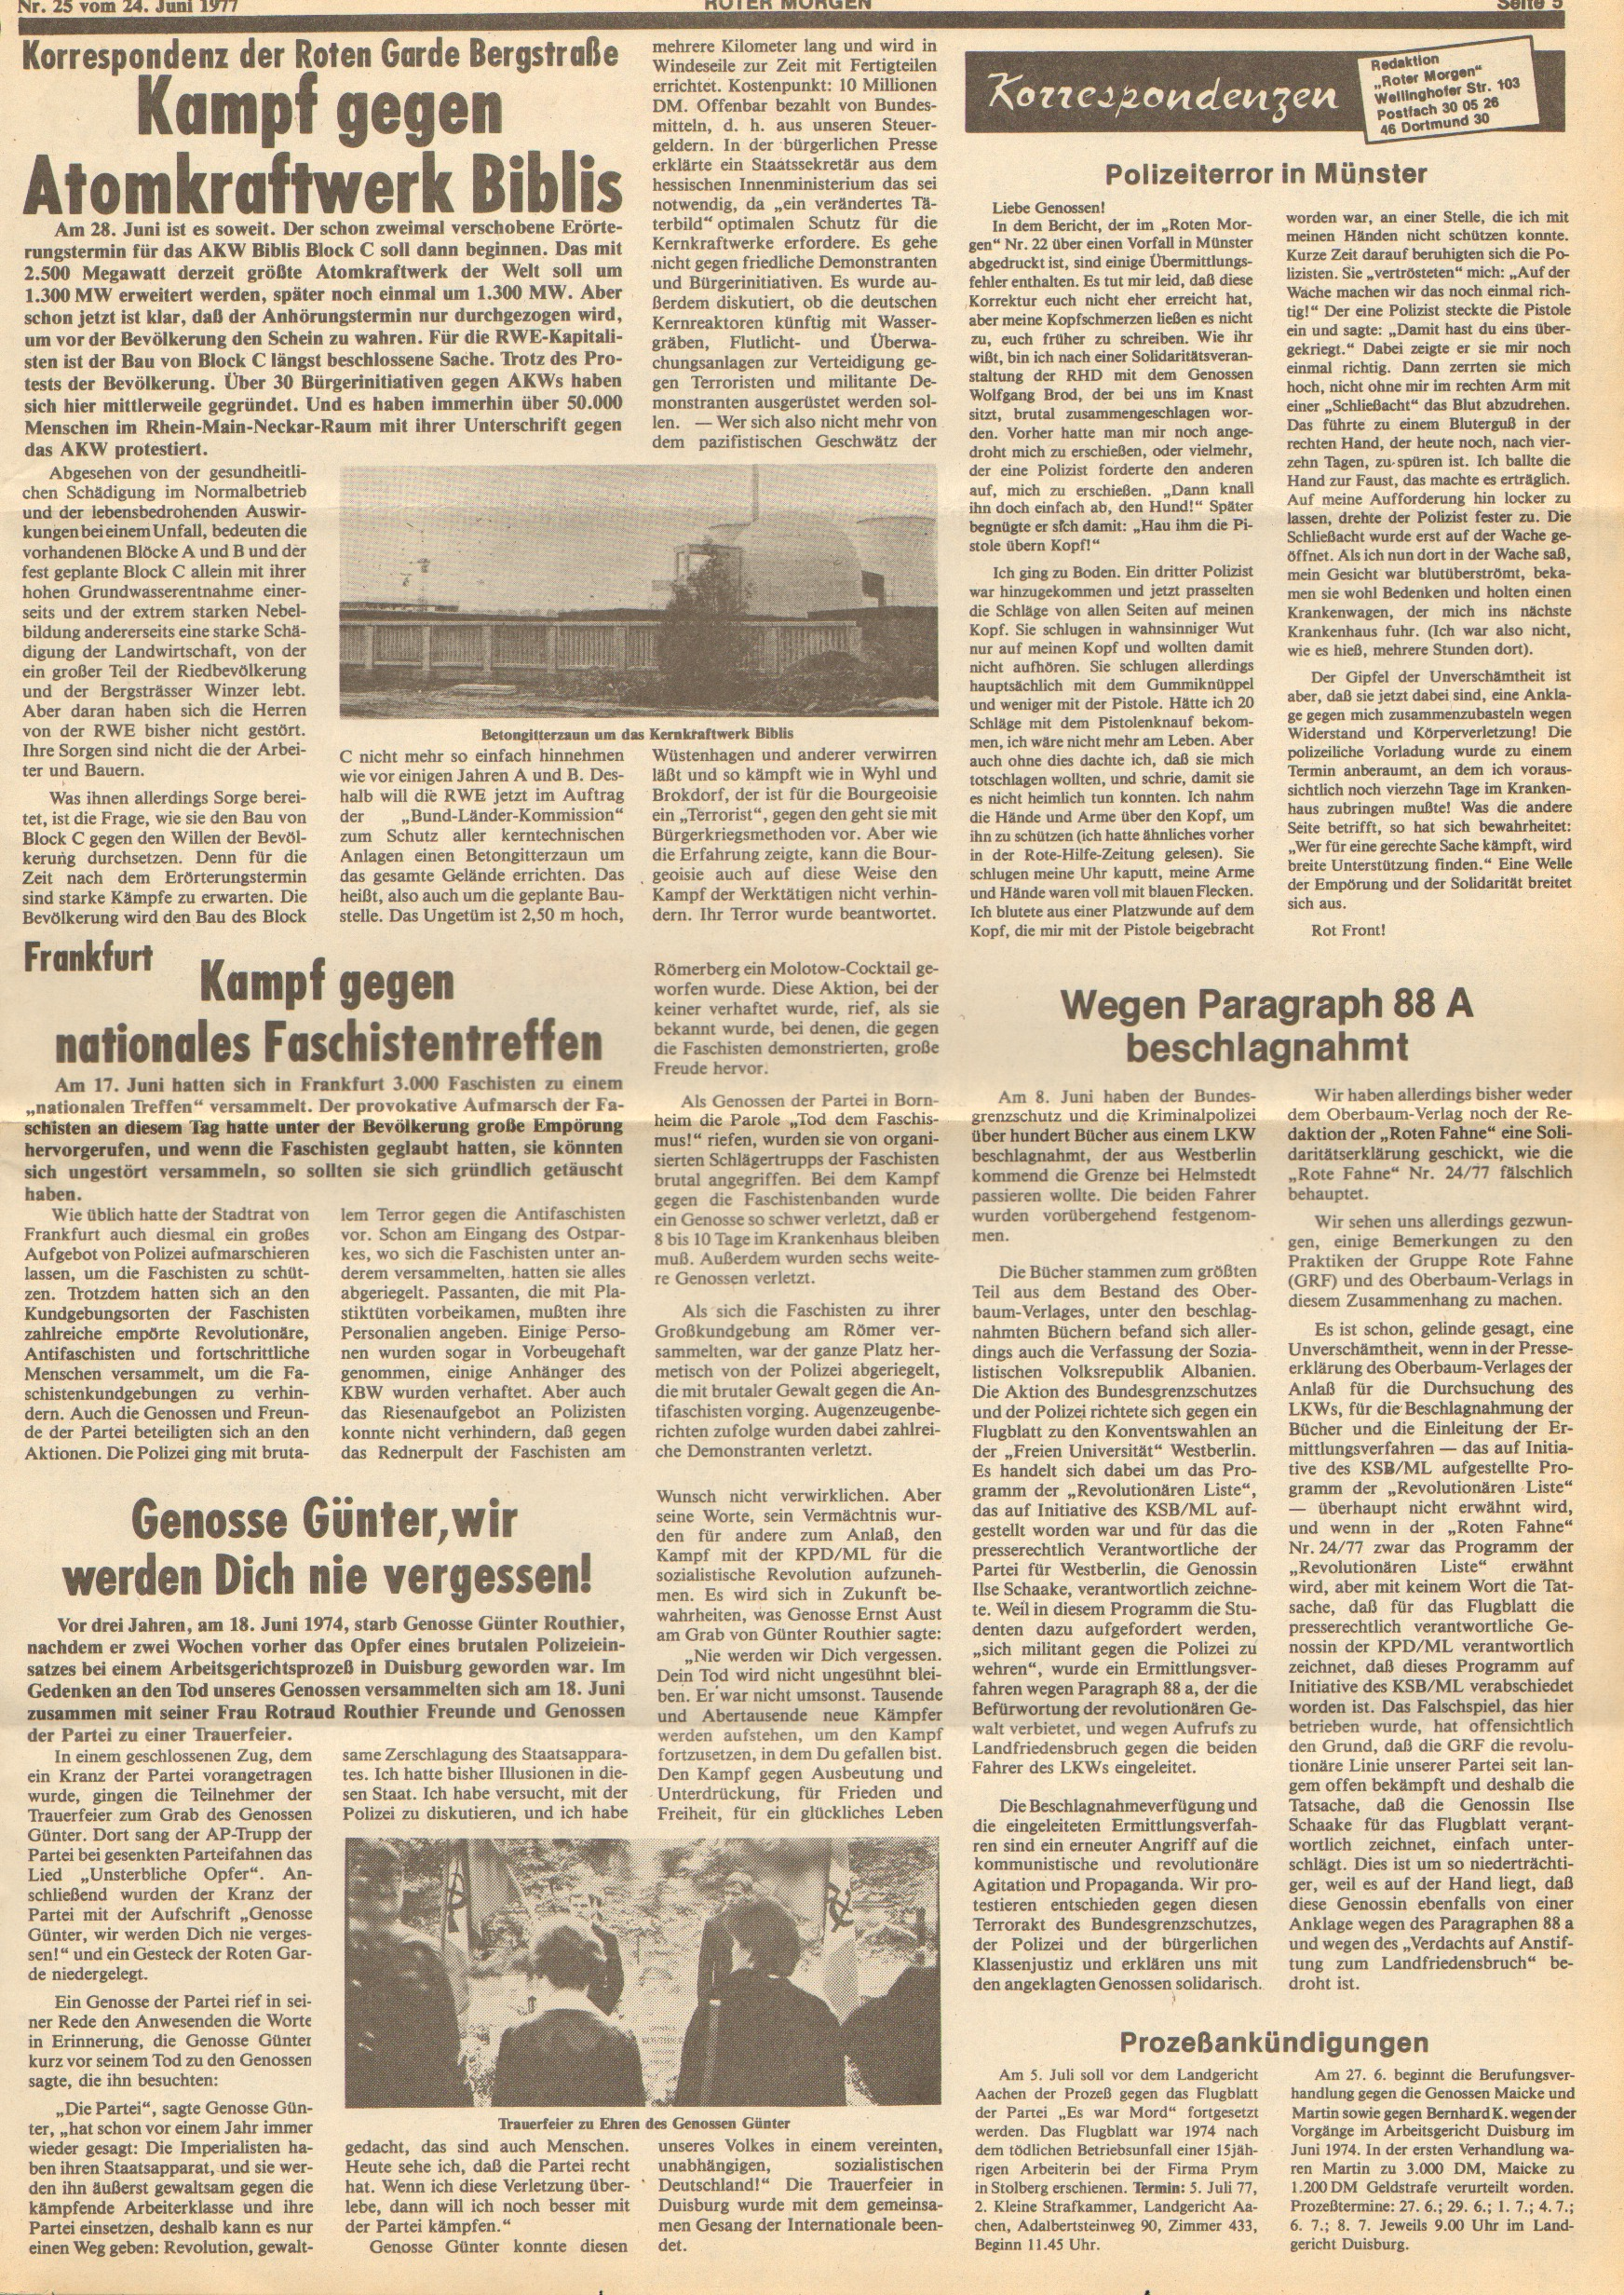 Roter Morgen, 11. Jg., 24. Juni 1977, Nr. 25, Seite 5